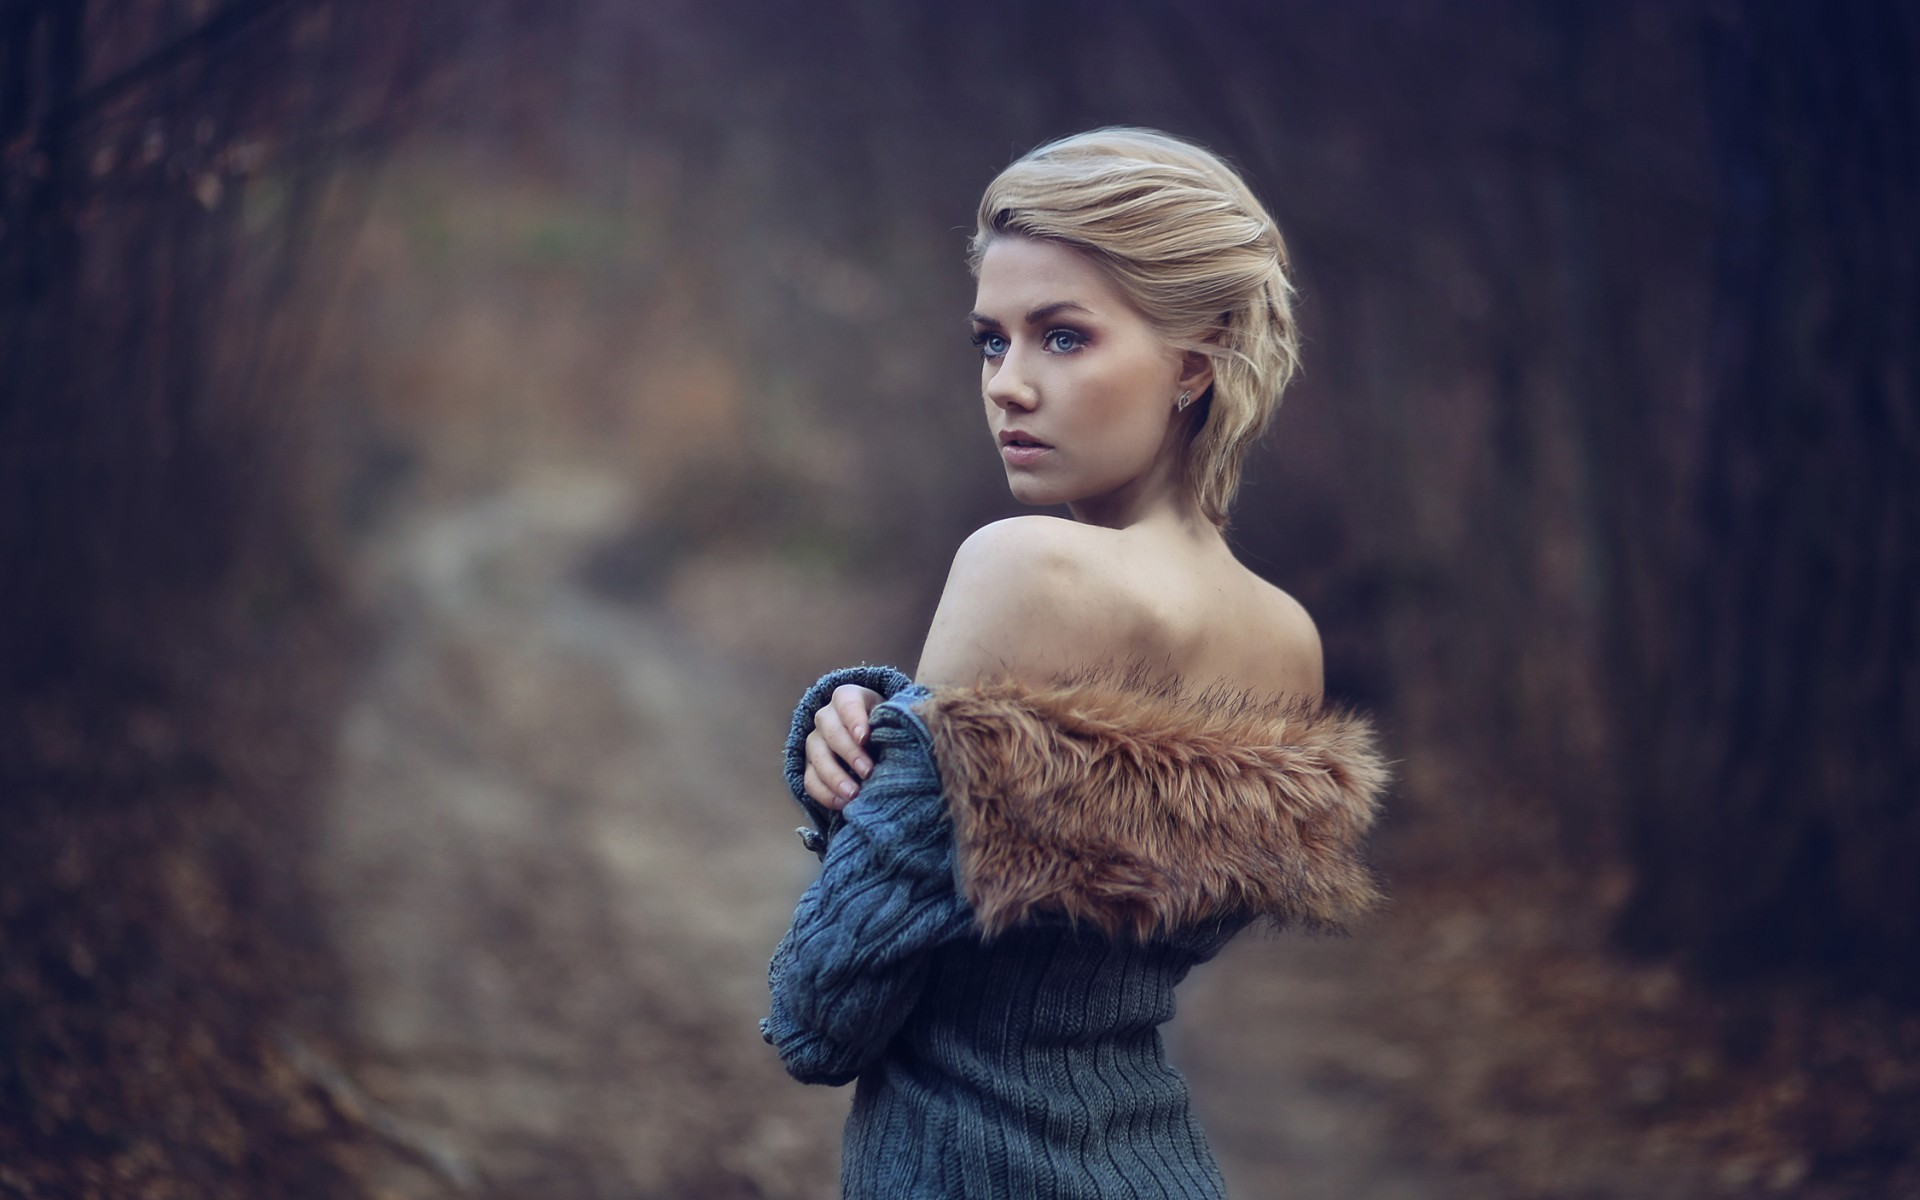 Res: 1920x1200, Girl Wearing Fur Coat